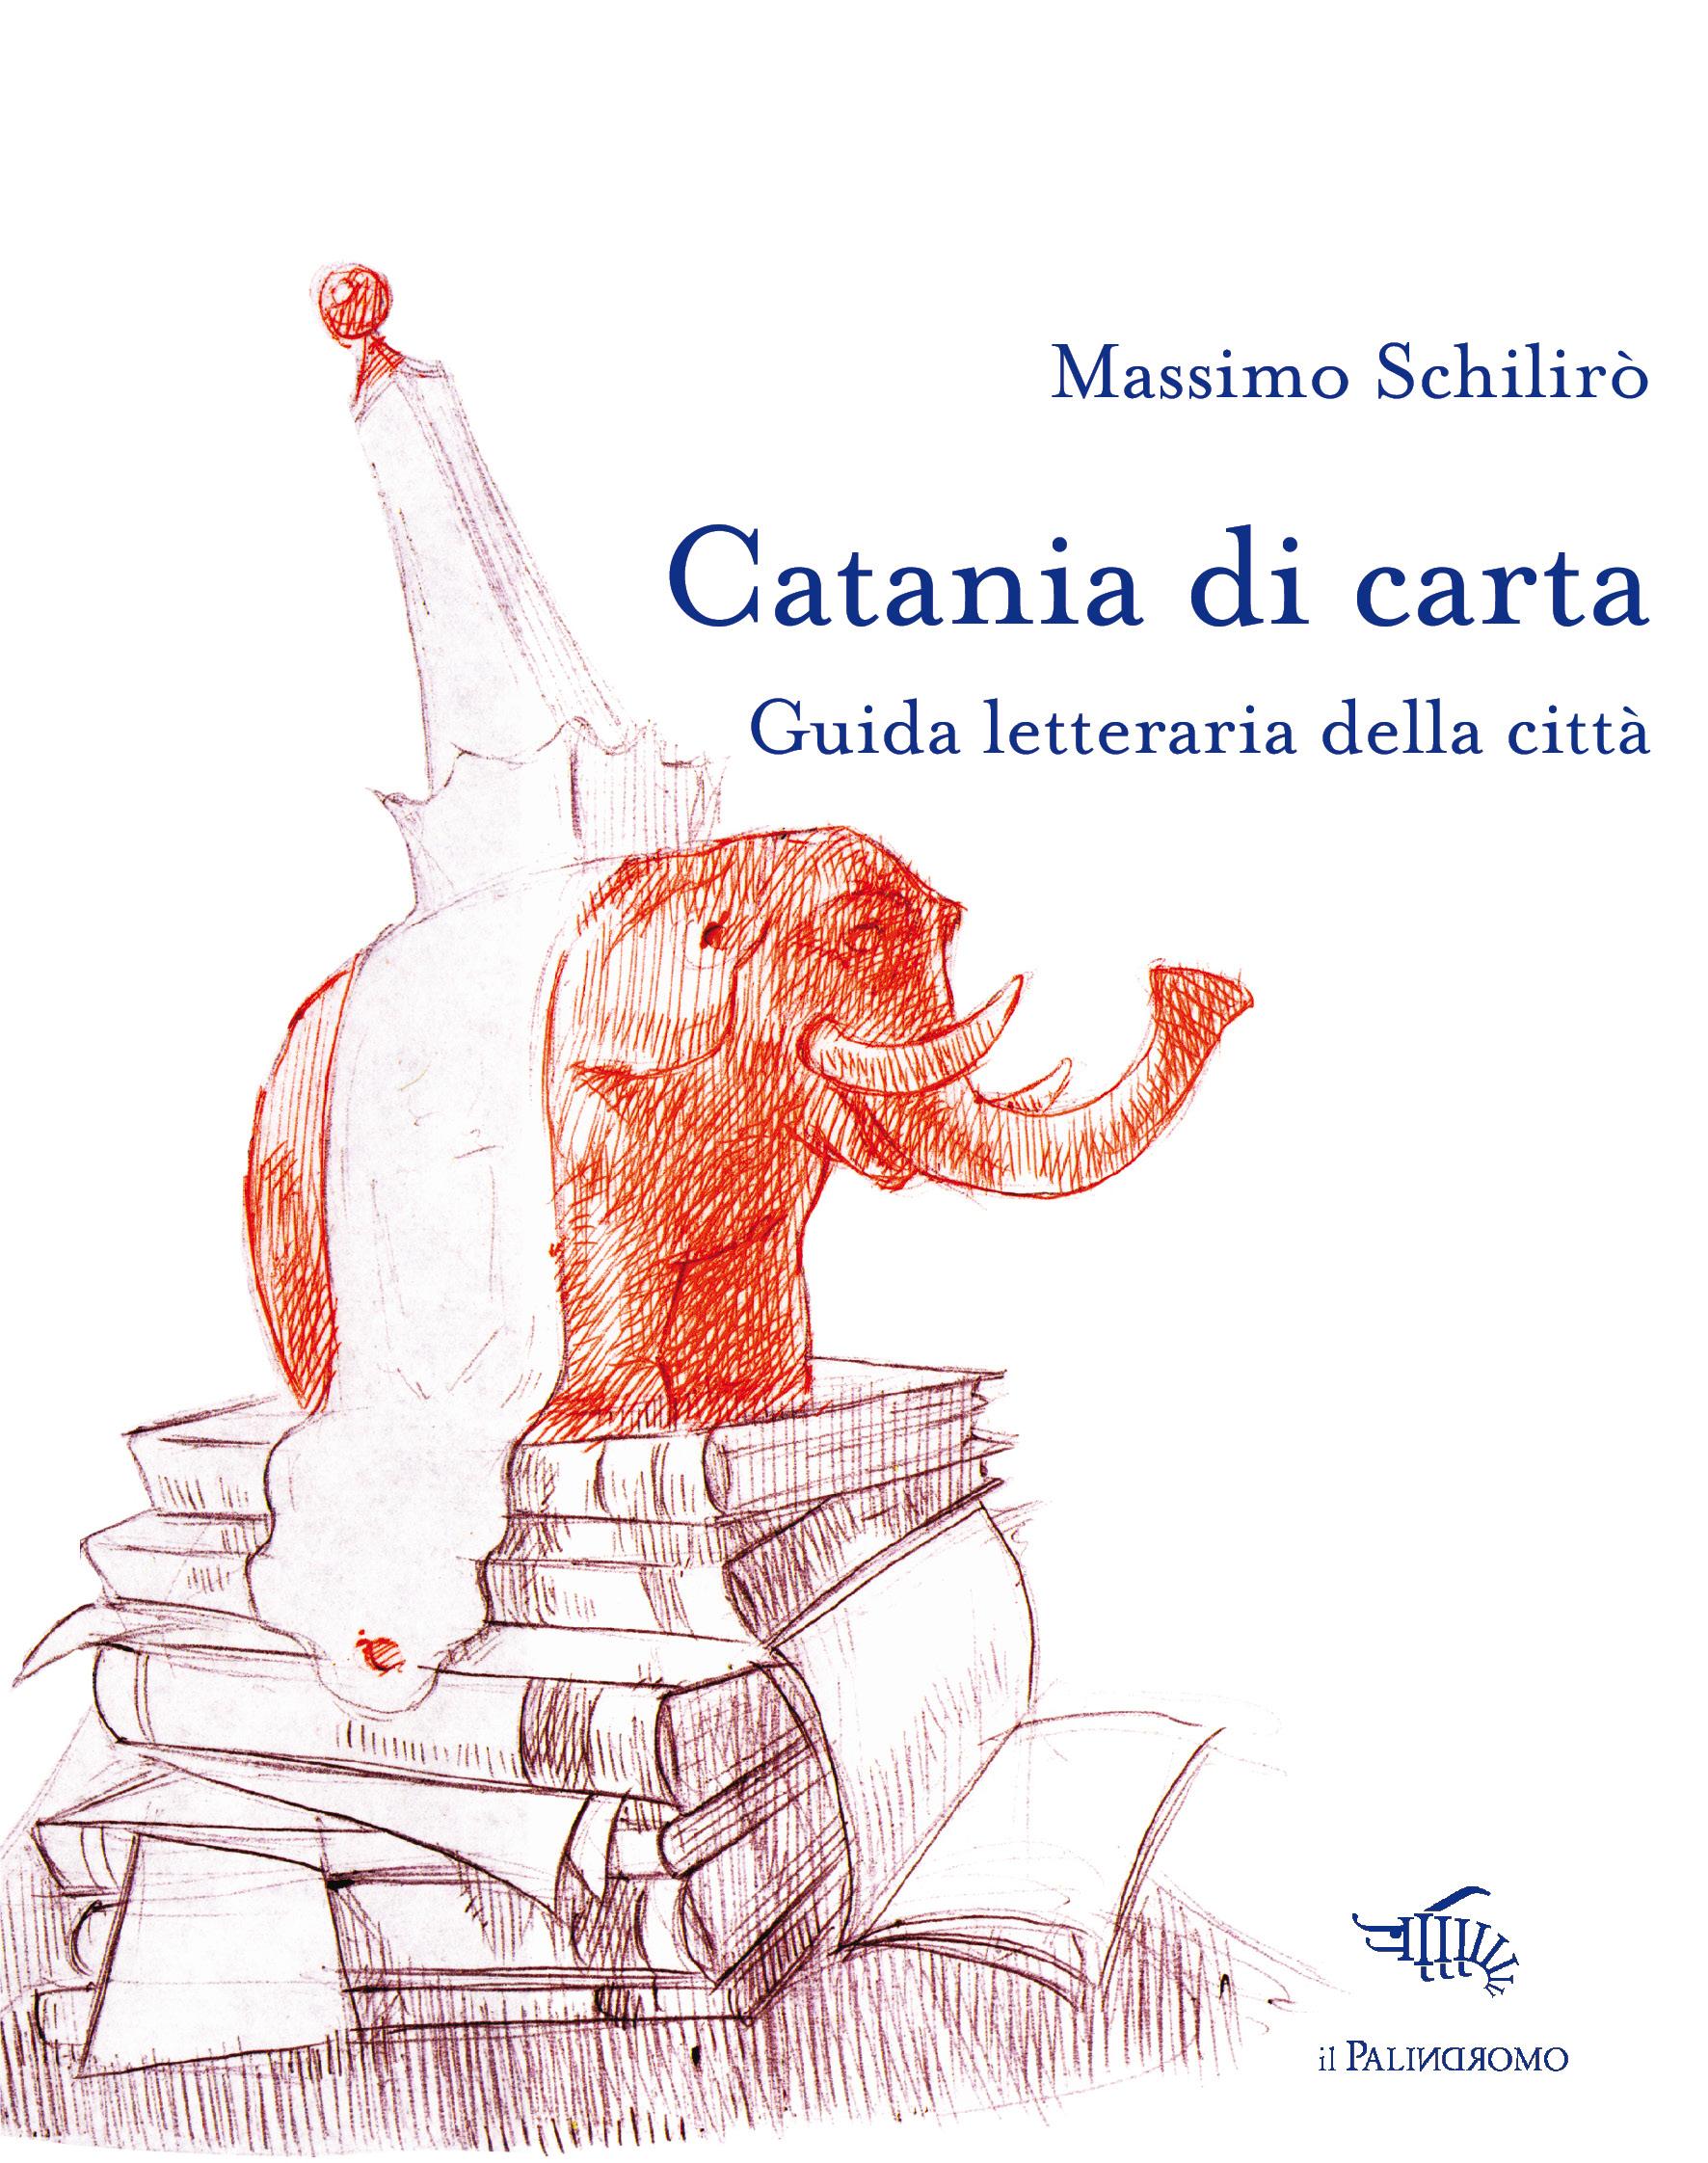 Autore: Massimo Schilirò